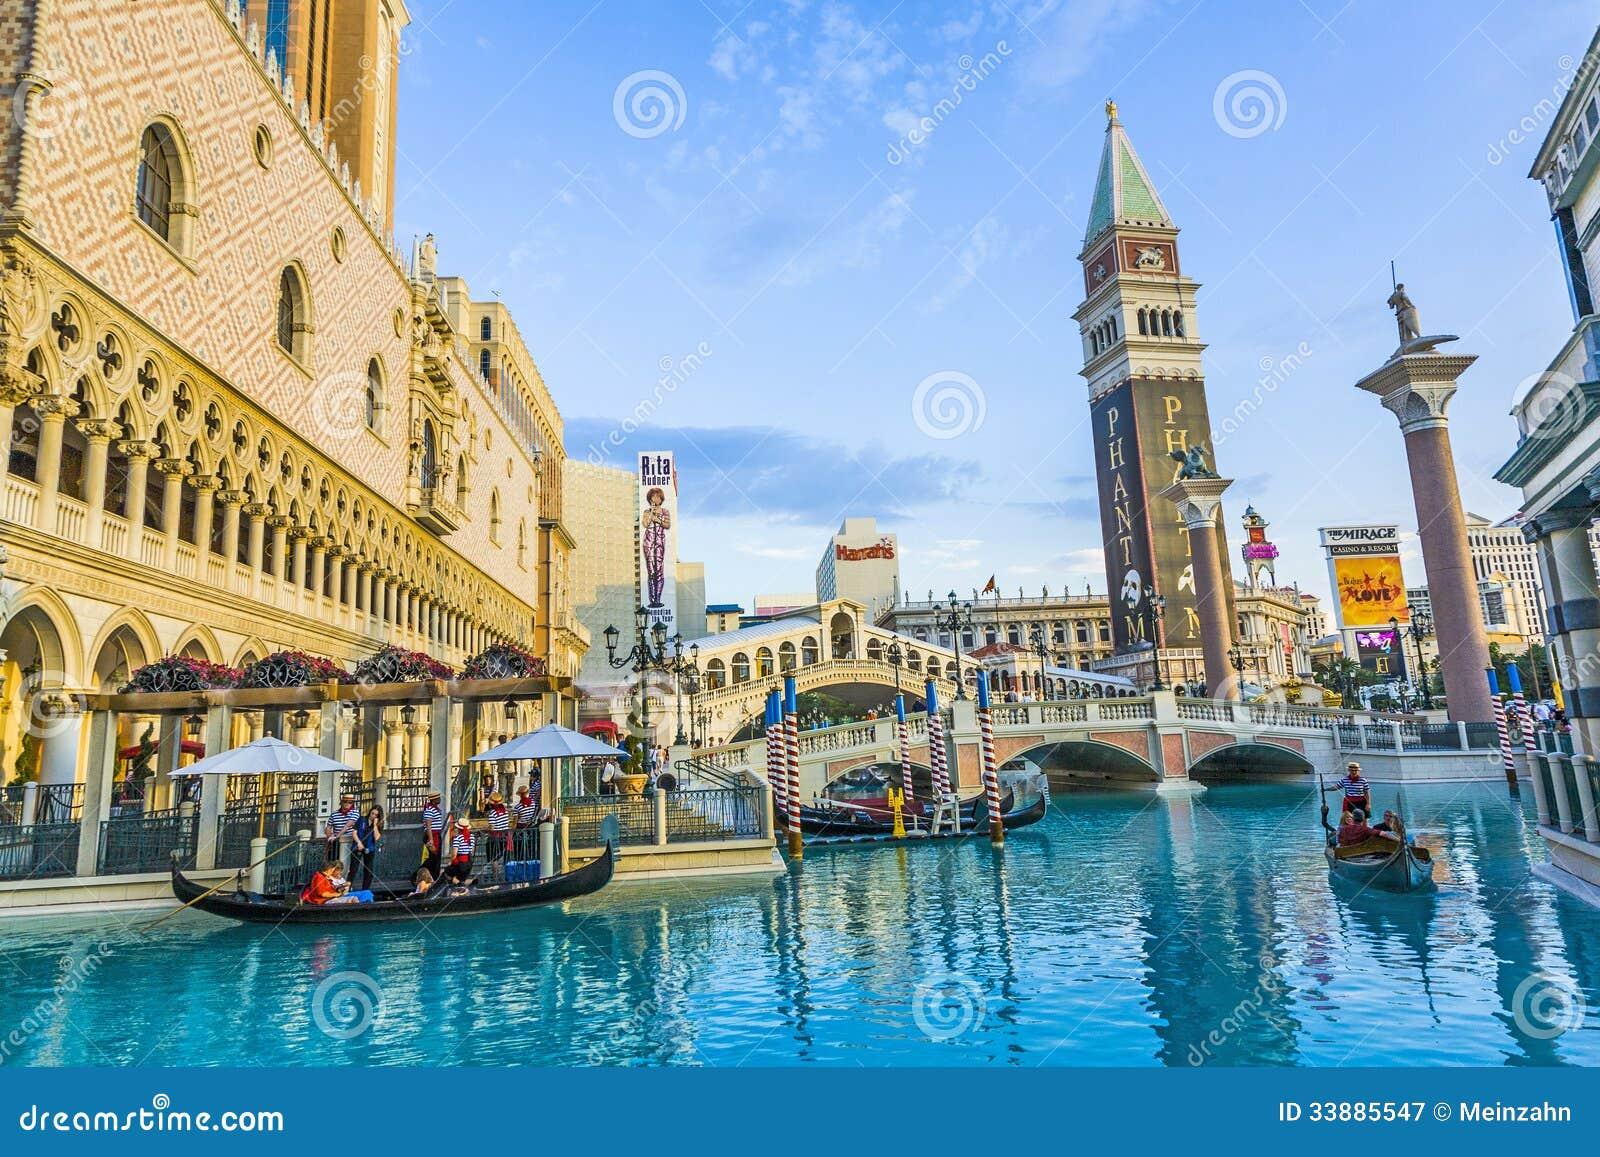 Hotel Londra Palace Venedig